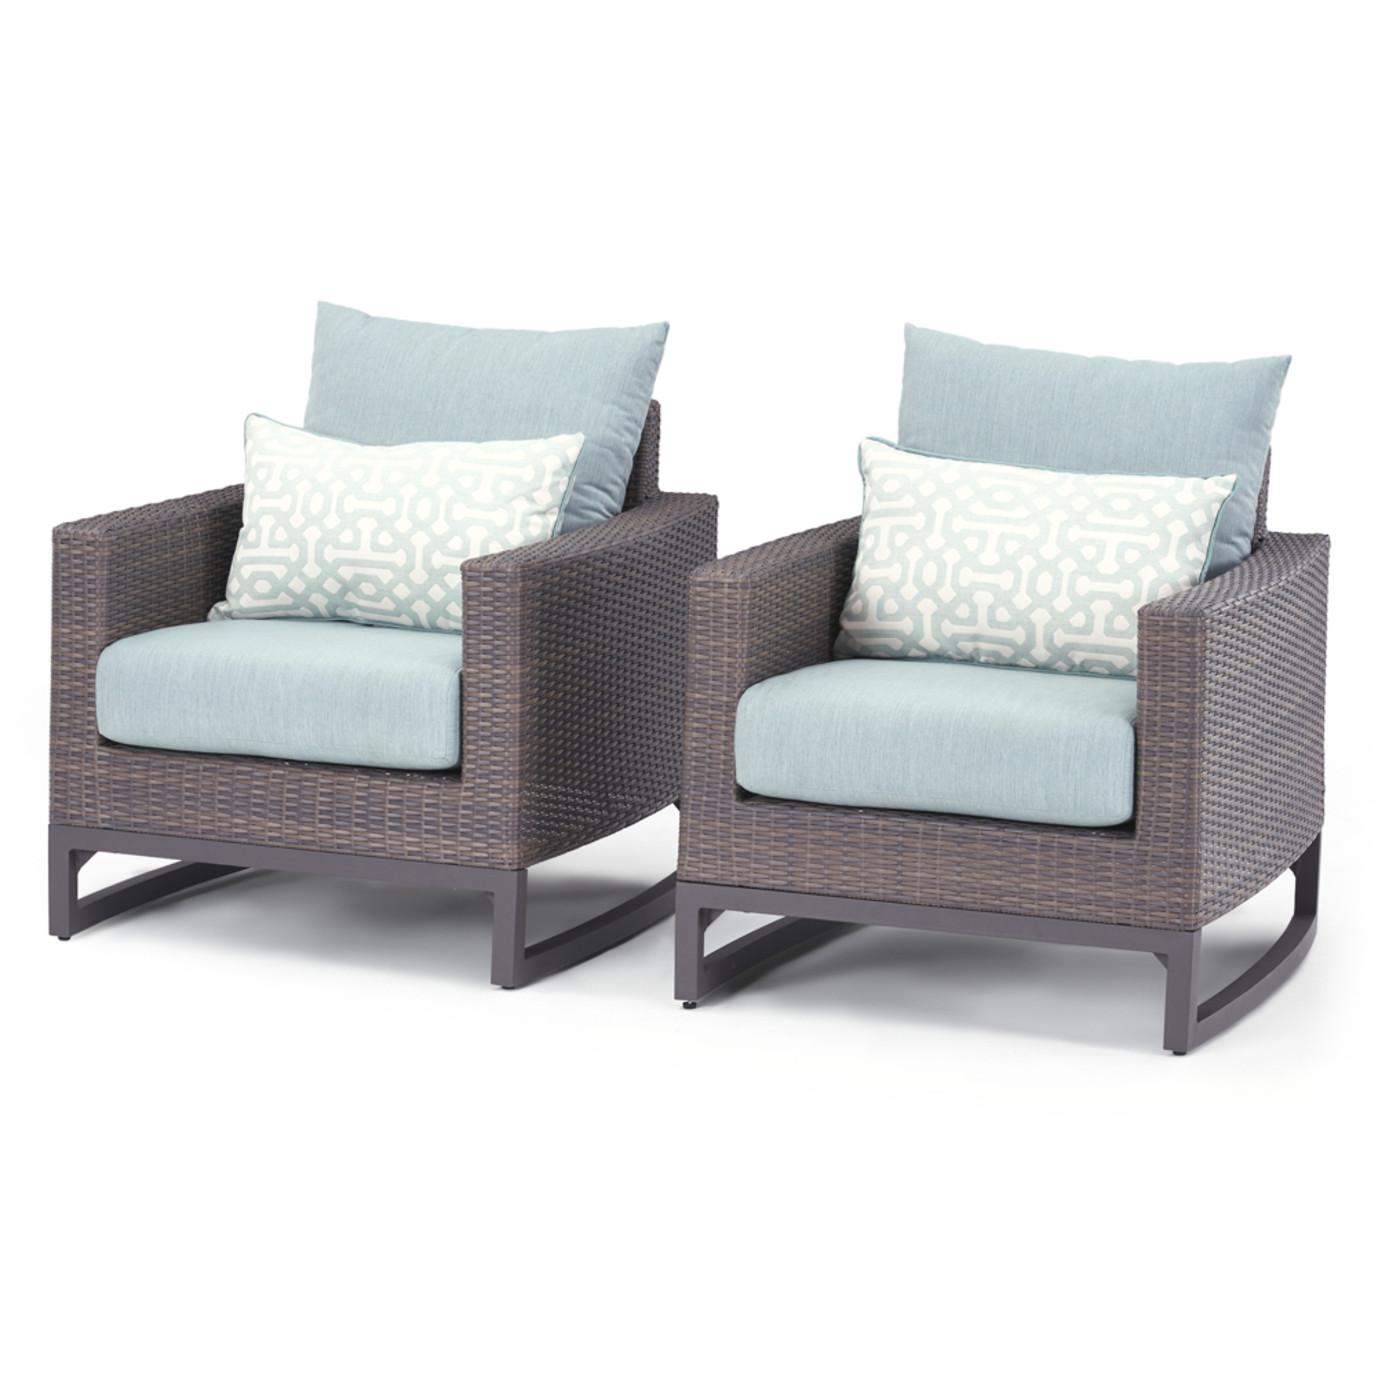 Milea 7 Piece Seating Set - Mist Blue